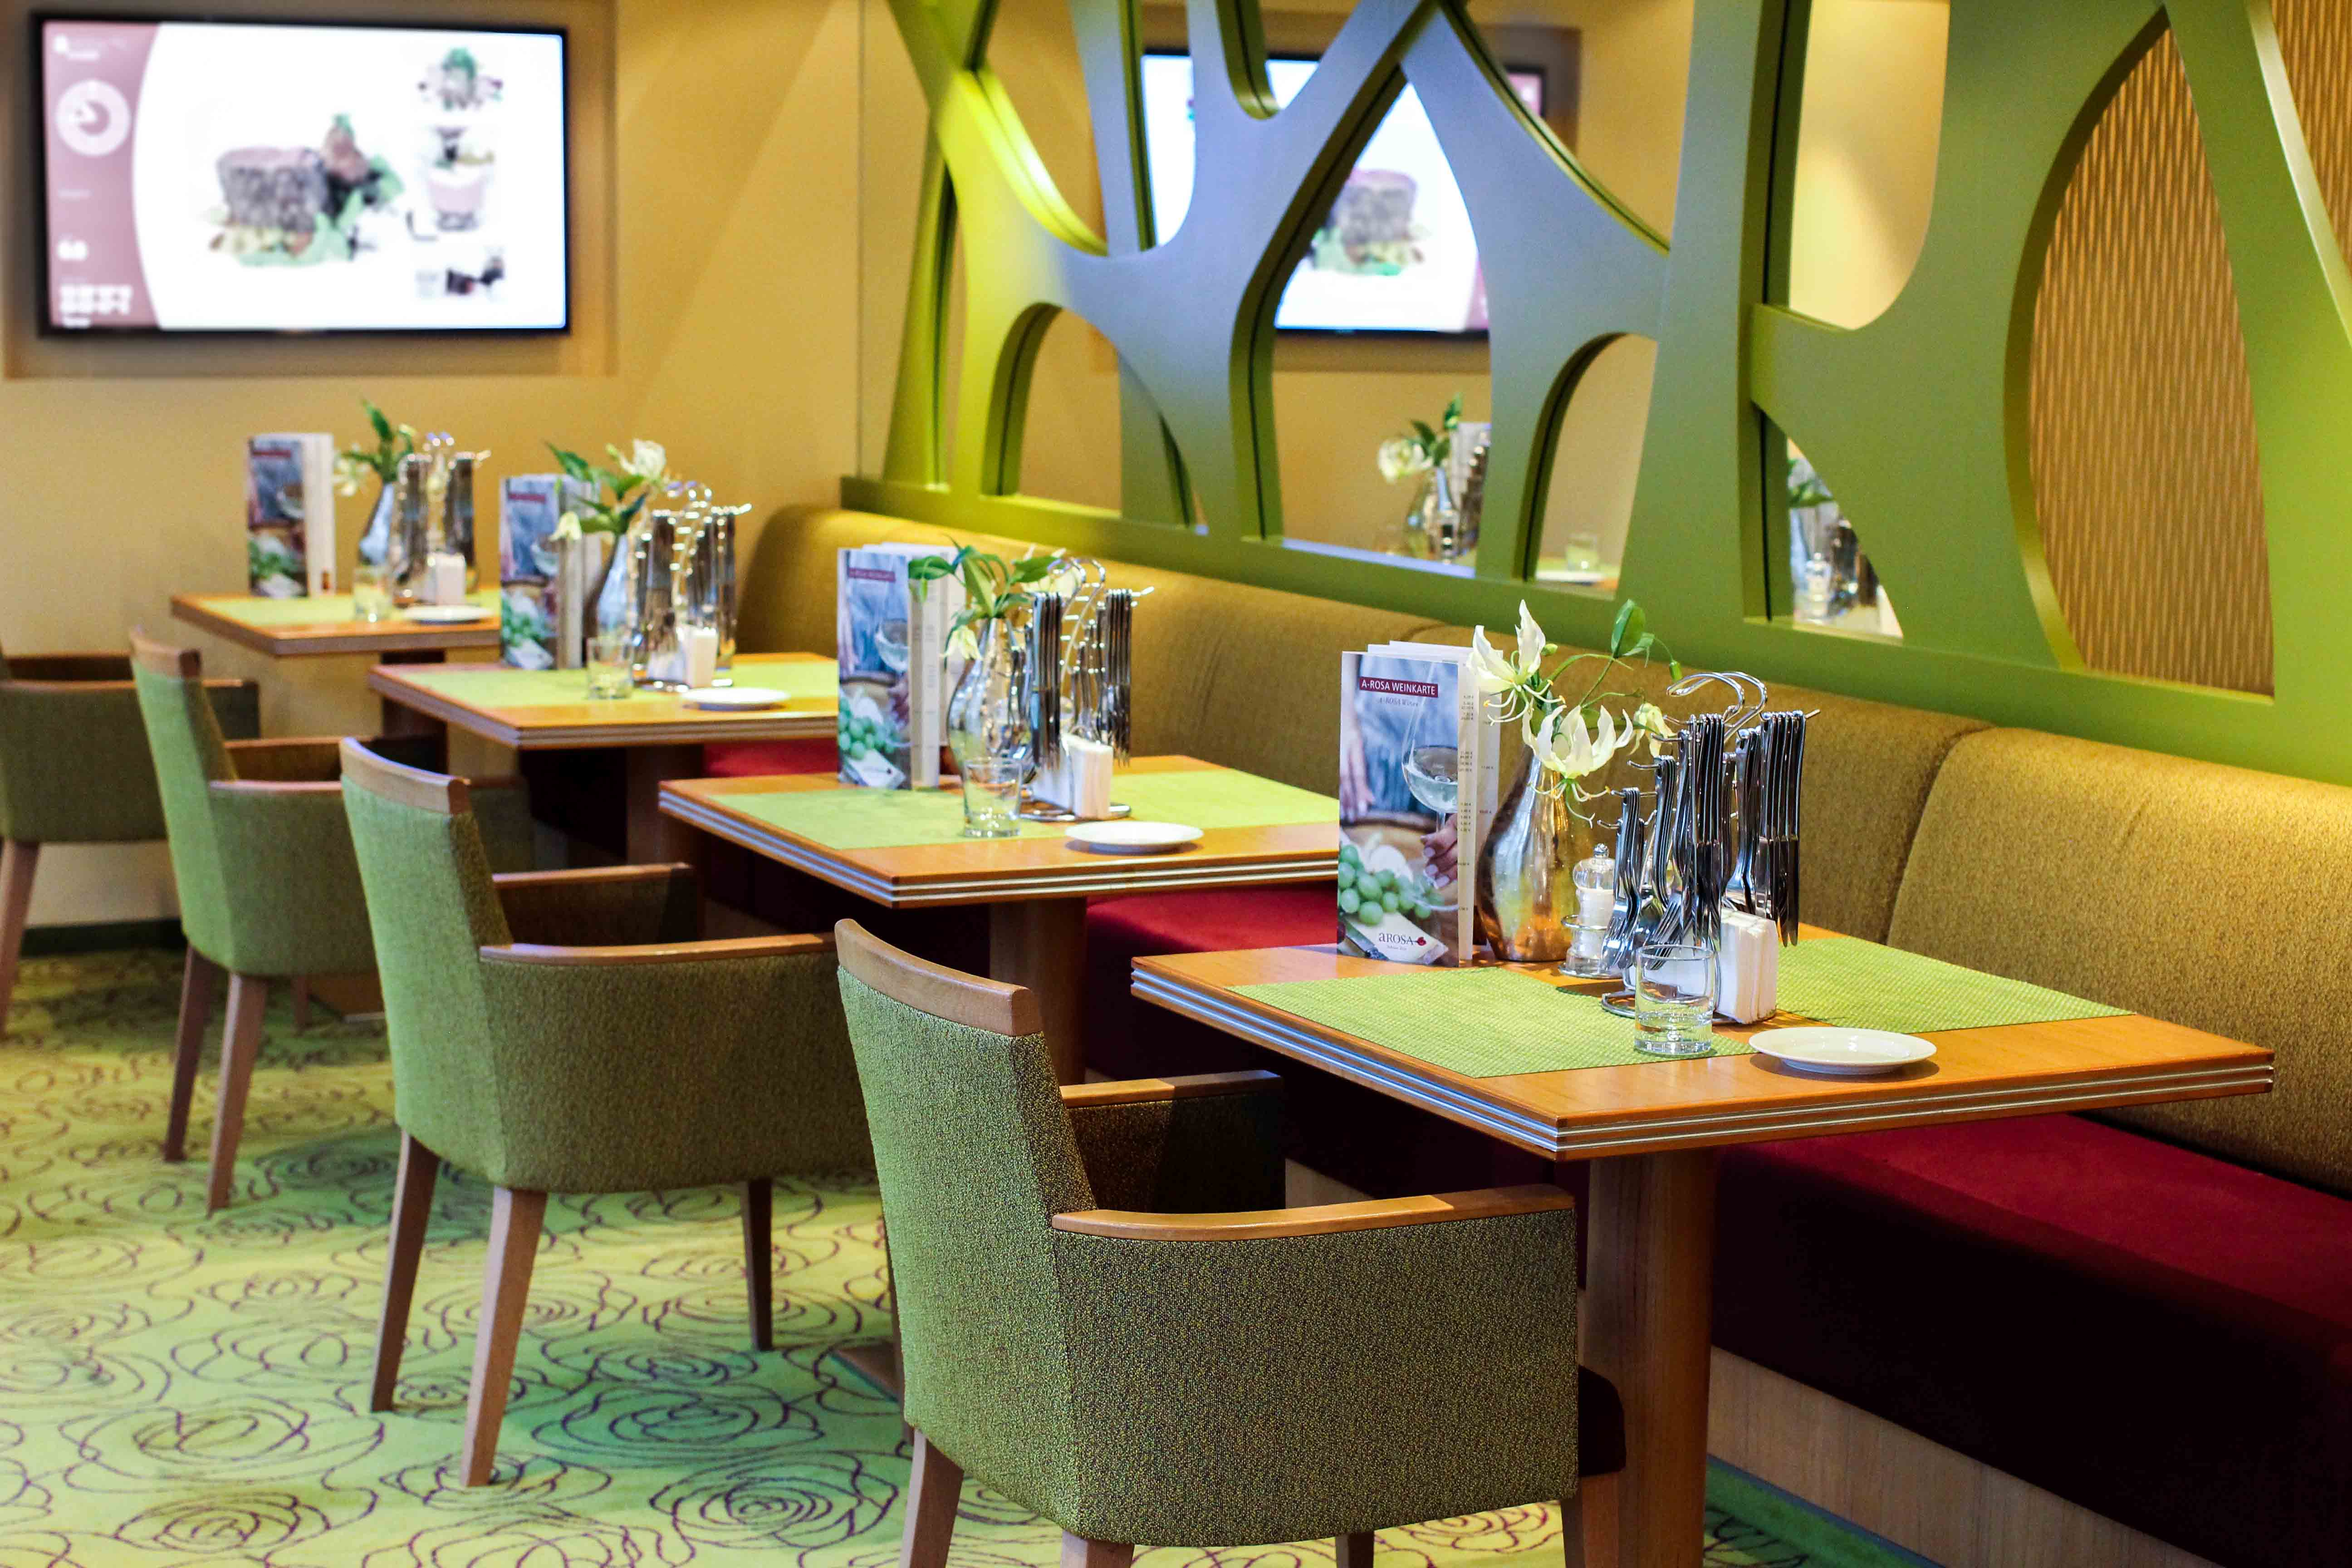 Buffet Restaurant Dinner Flusskreuzfahrt A-ROSA SILVA Kreuzfahrtschiff Rhein Erlebnis Kurs Amsterdam Erfahrung Flusskreuzfahrt Reiseblog